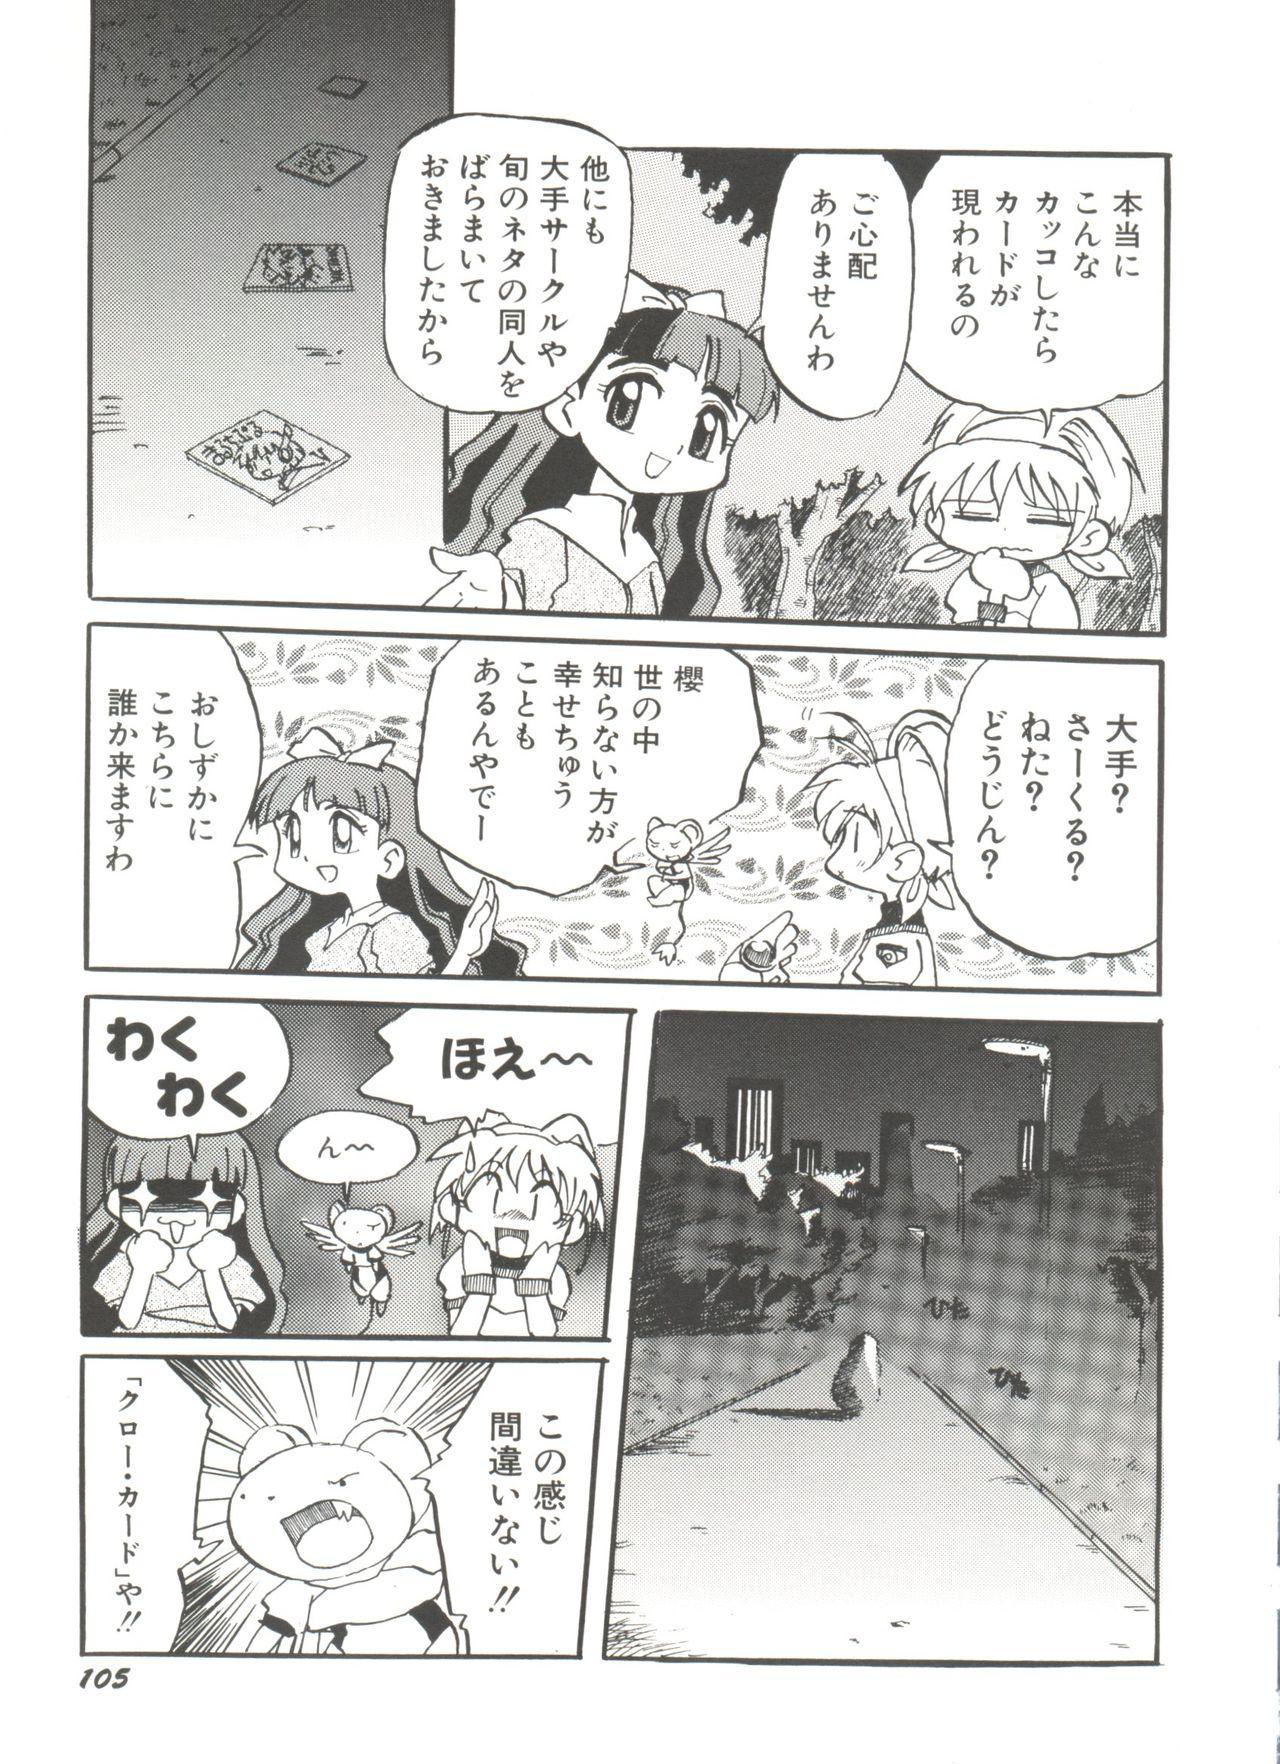 [Anthology] Denei Tamatebako 8 - Utakata no Tenshi-tachi II (Various) 106